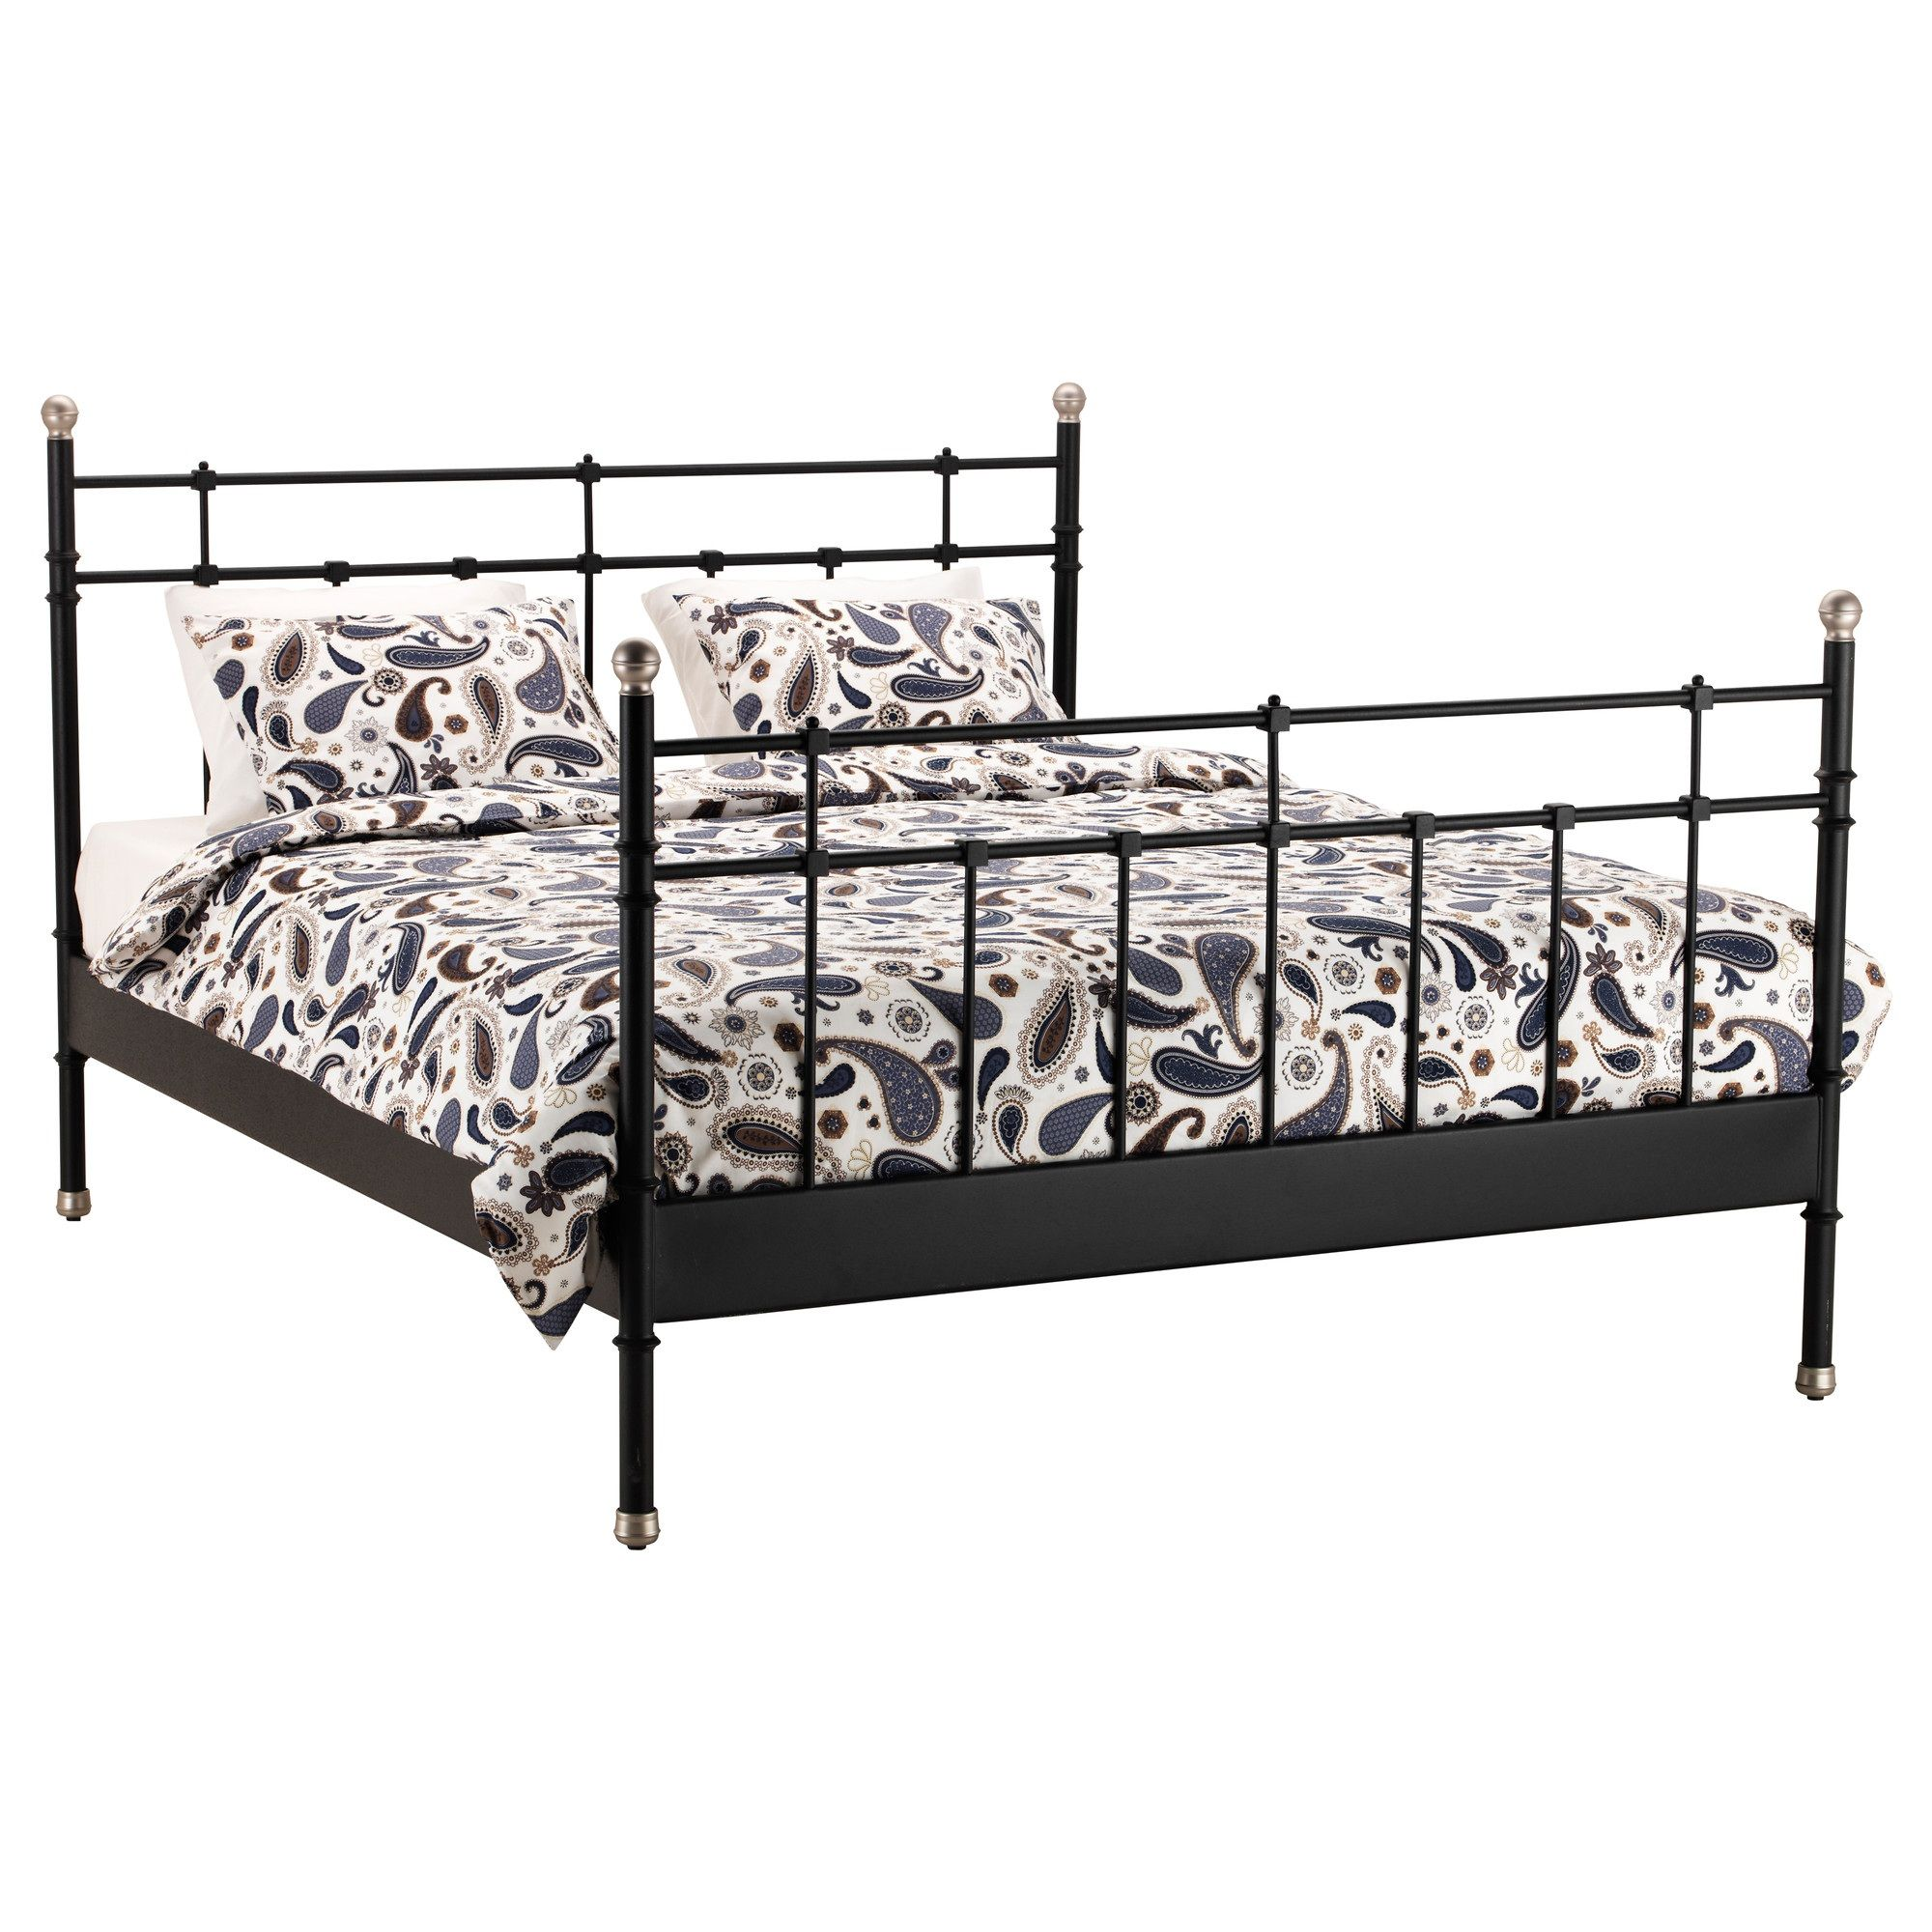 Surprising Ikea Metal Bed Frame Ikea Metal Bed Frame Ikea Metal Bed Metal Platform Bed